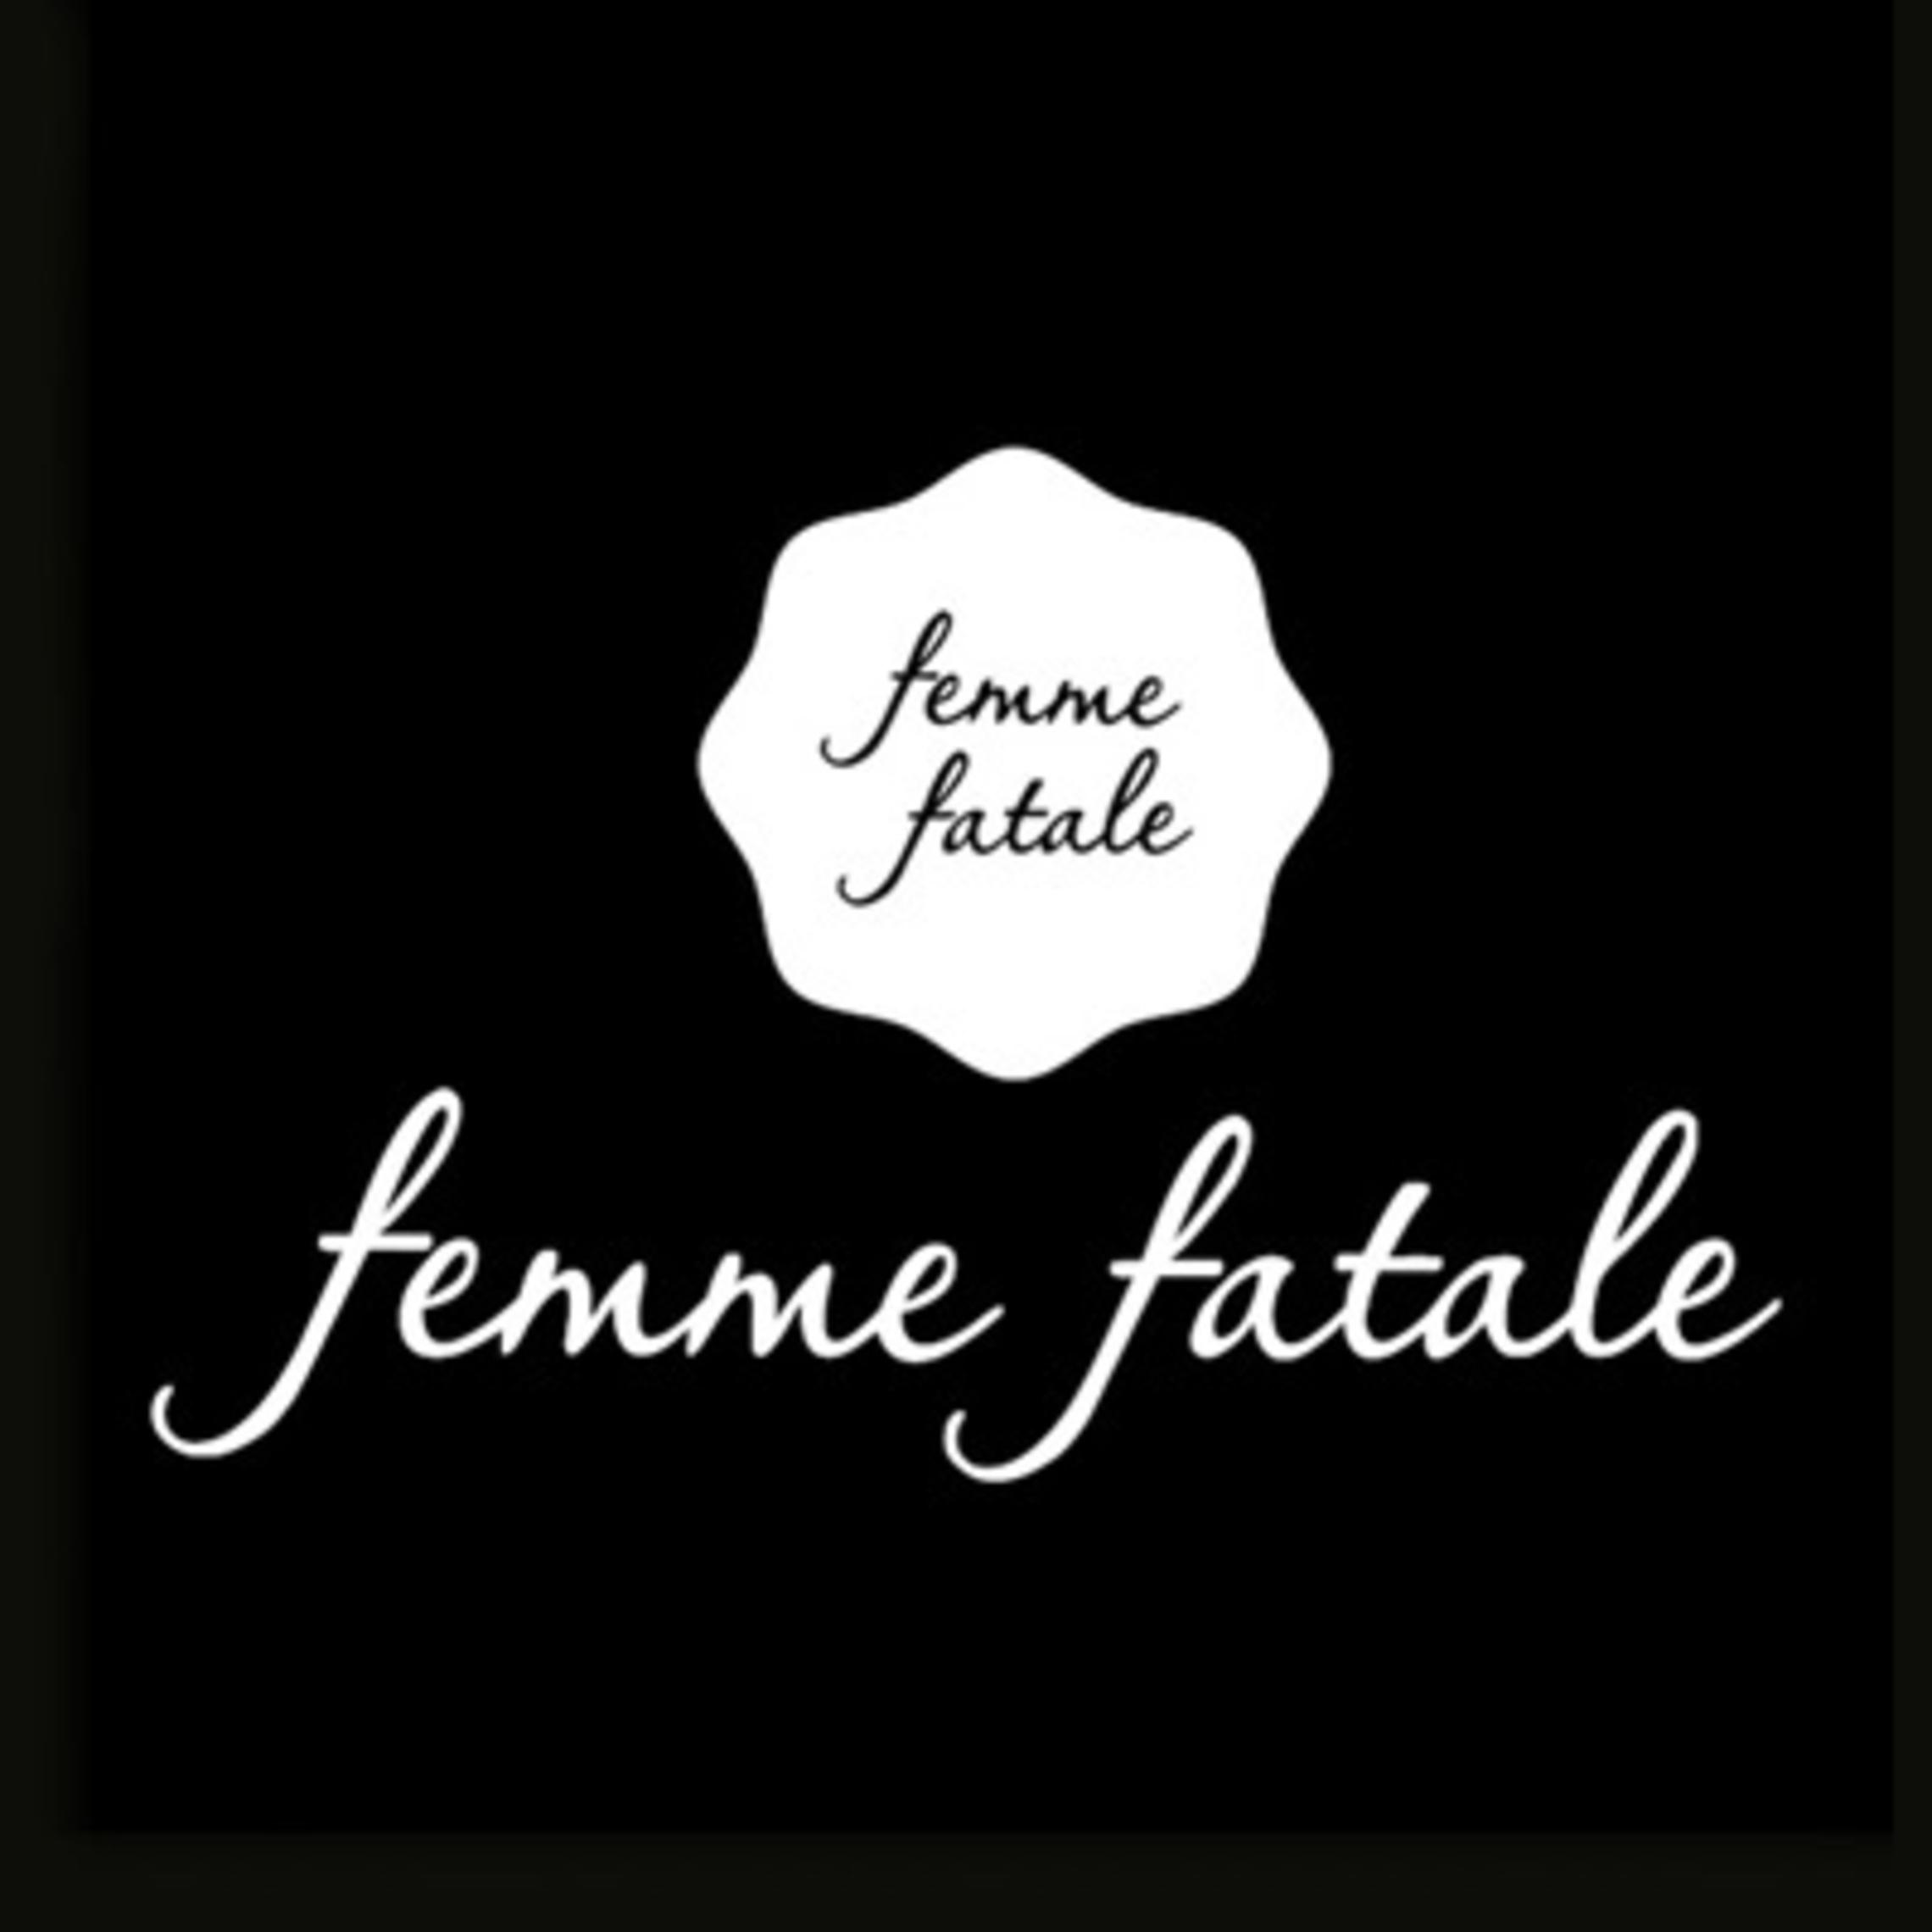 femme fatale- company logo